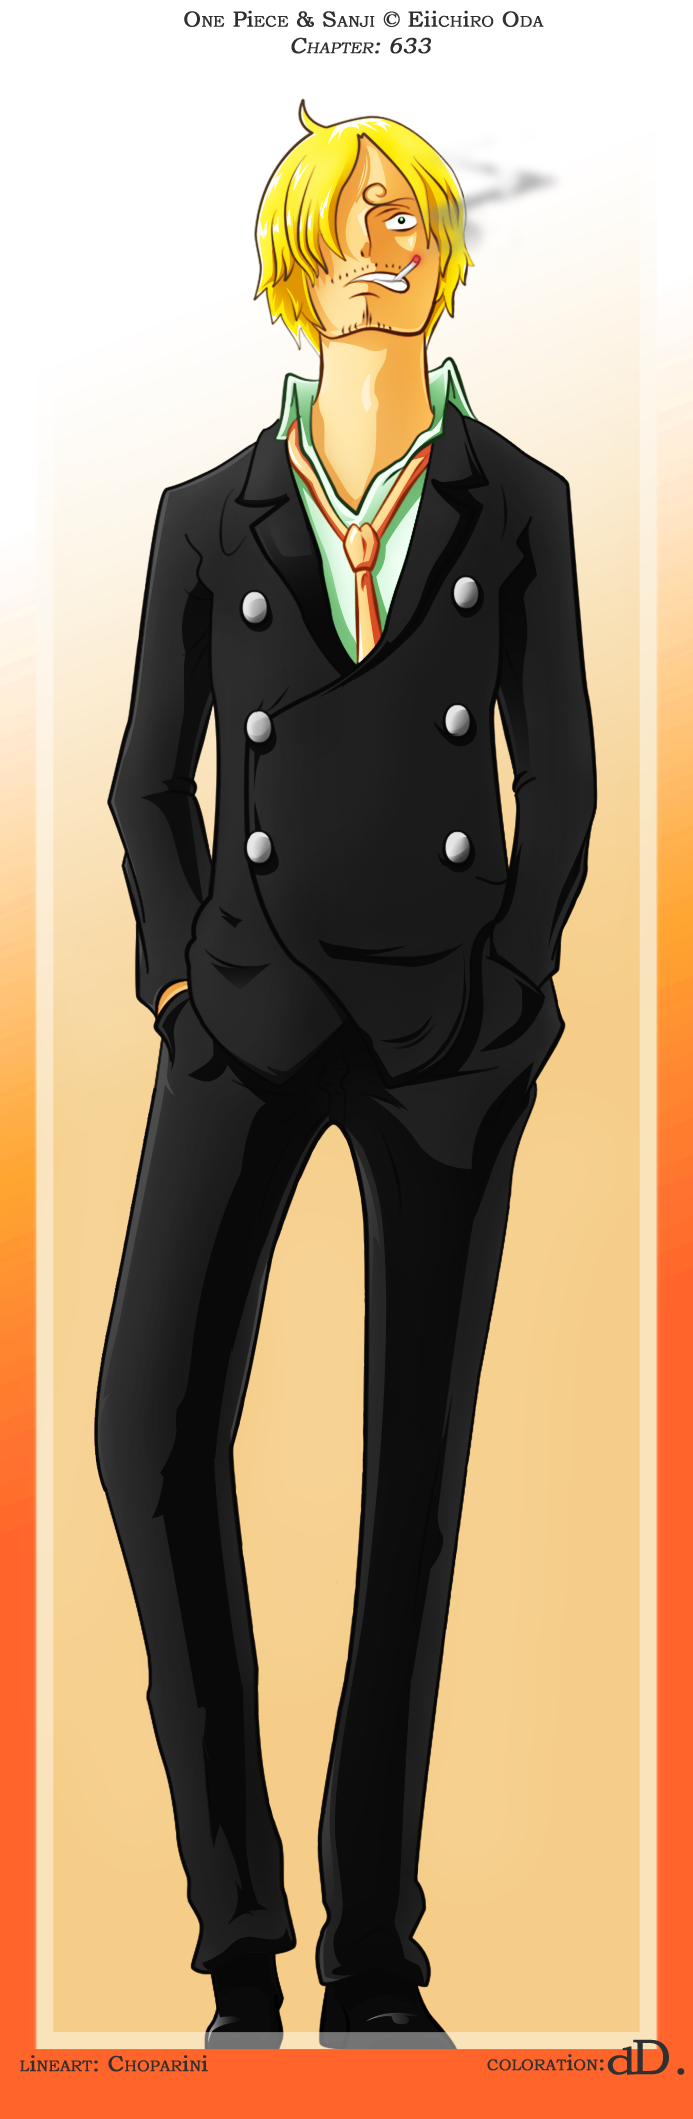 Blackleg Sanji